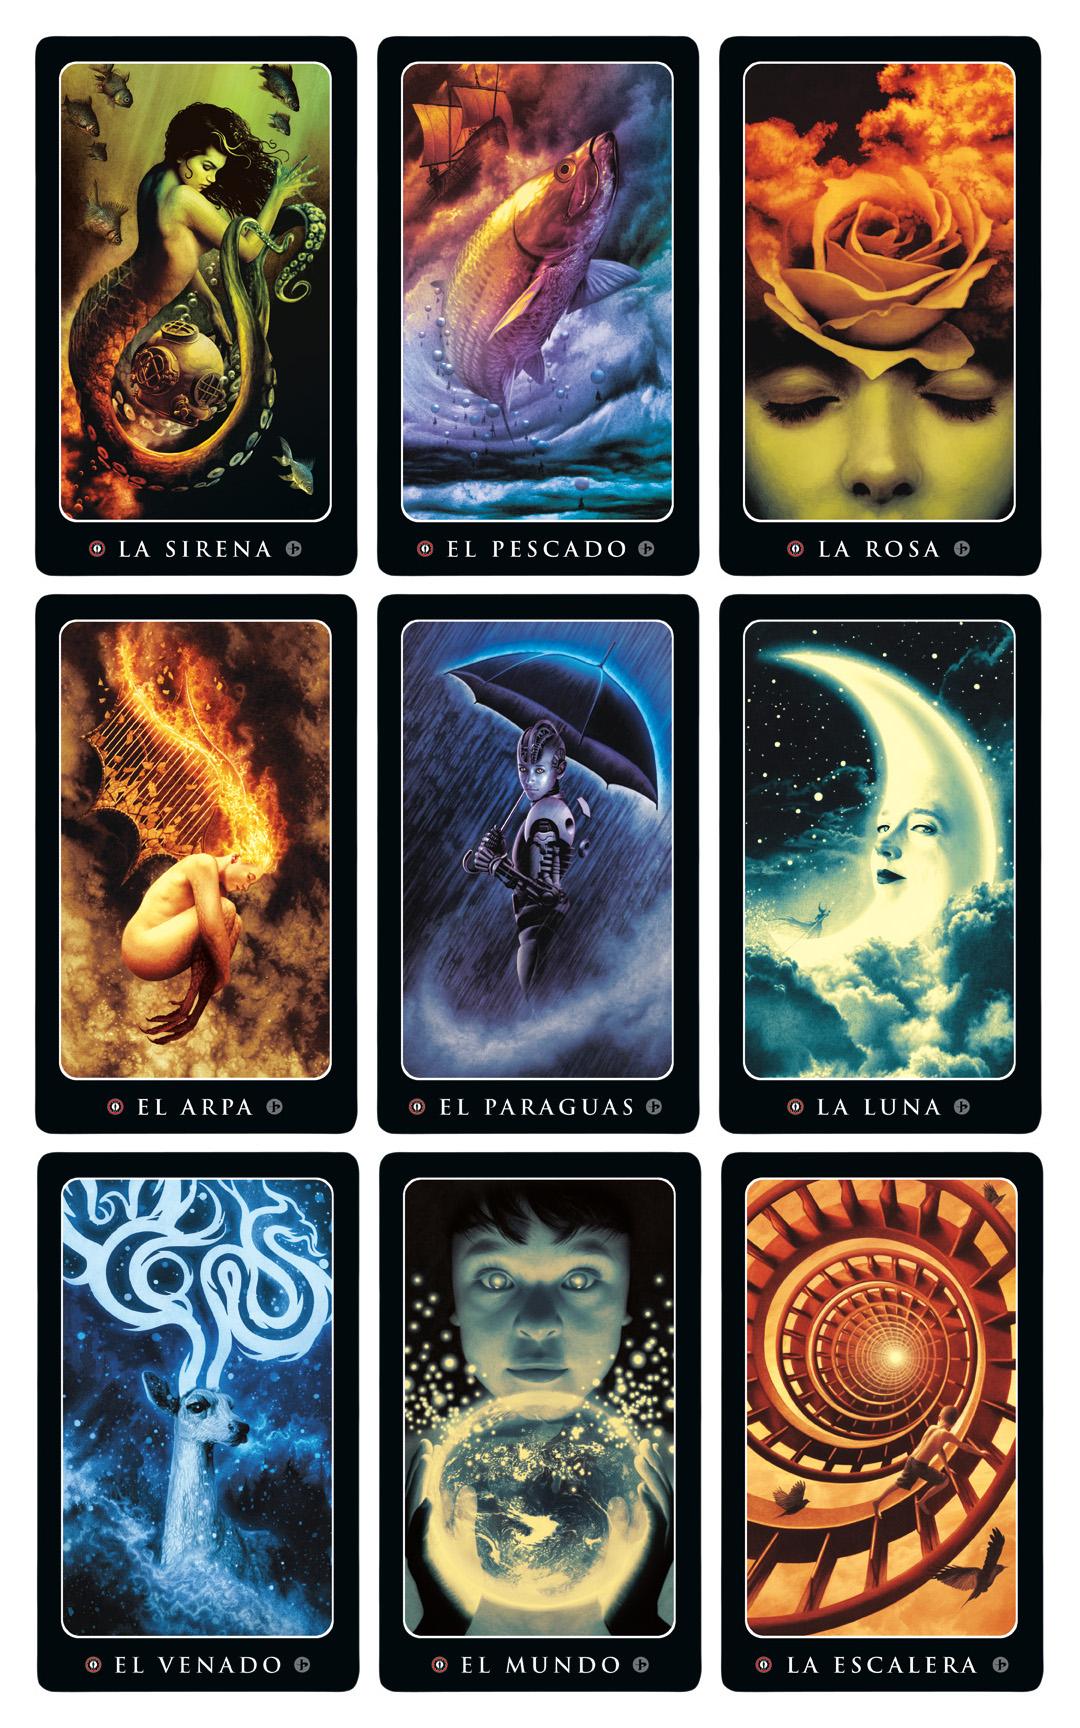 Loteria Grande cards by John Picacio